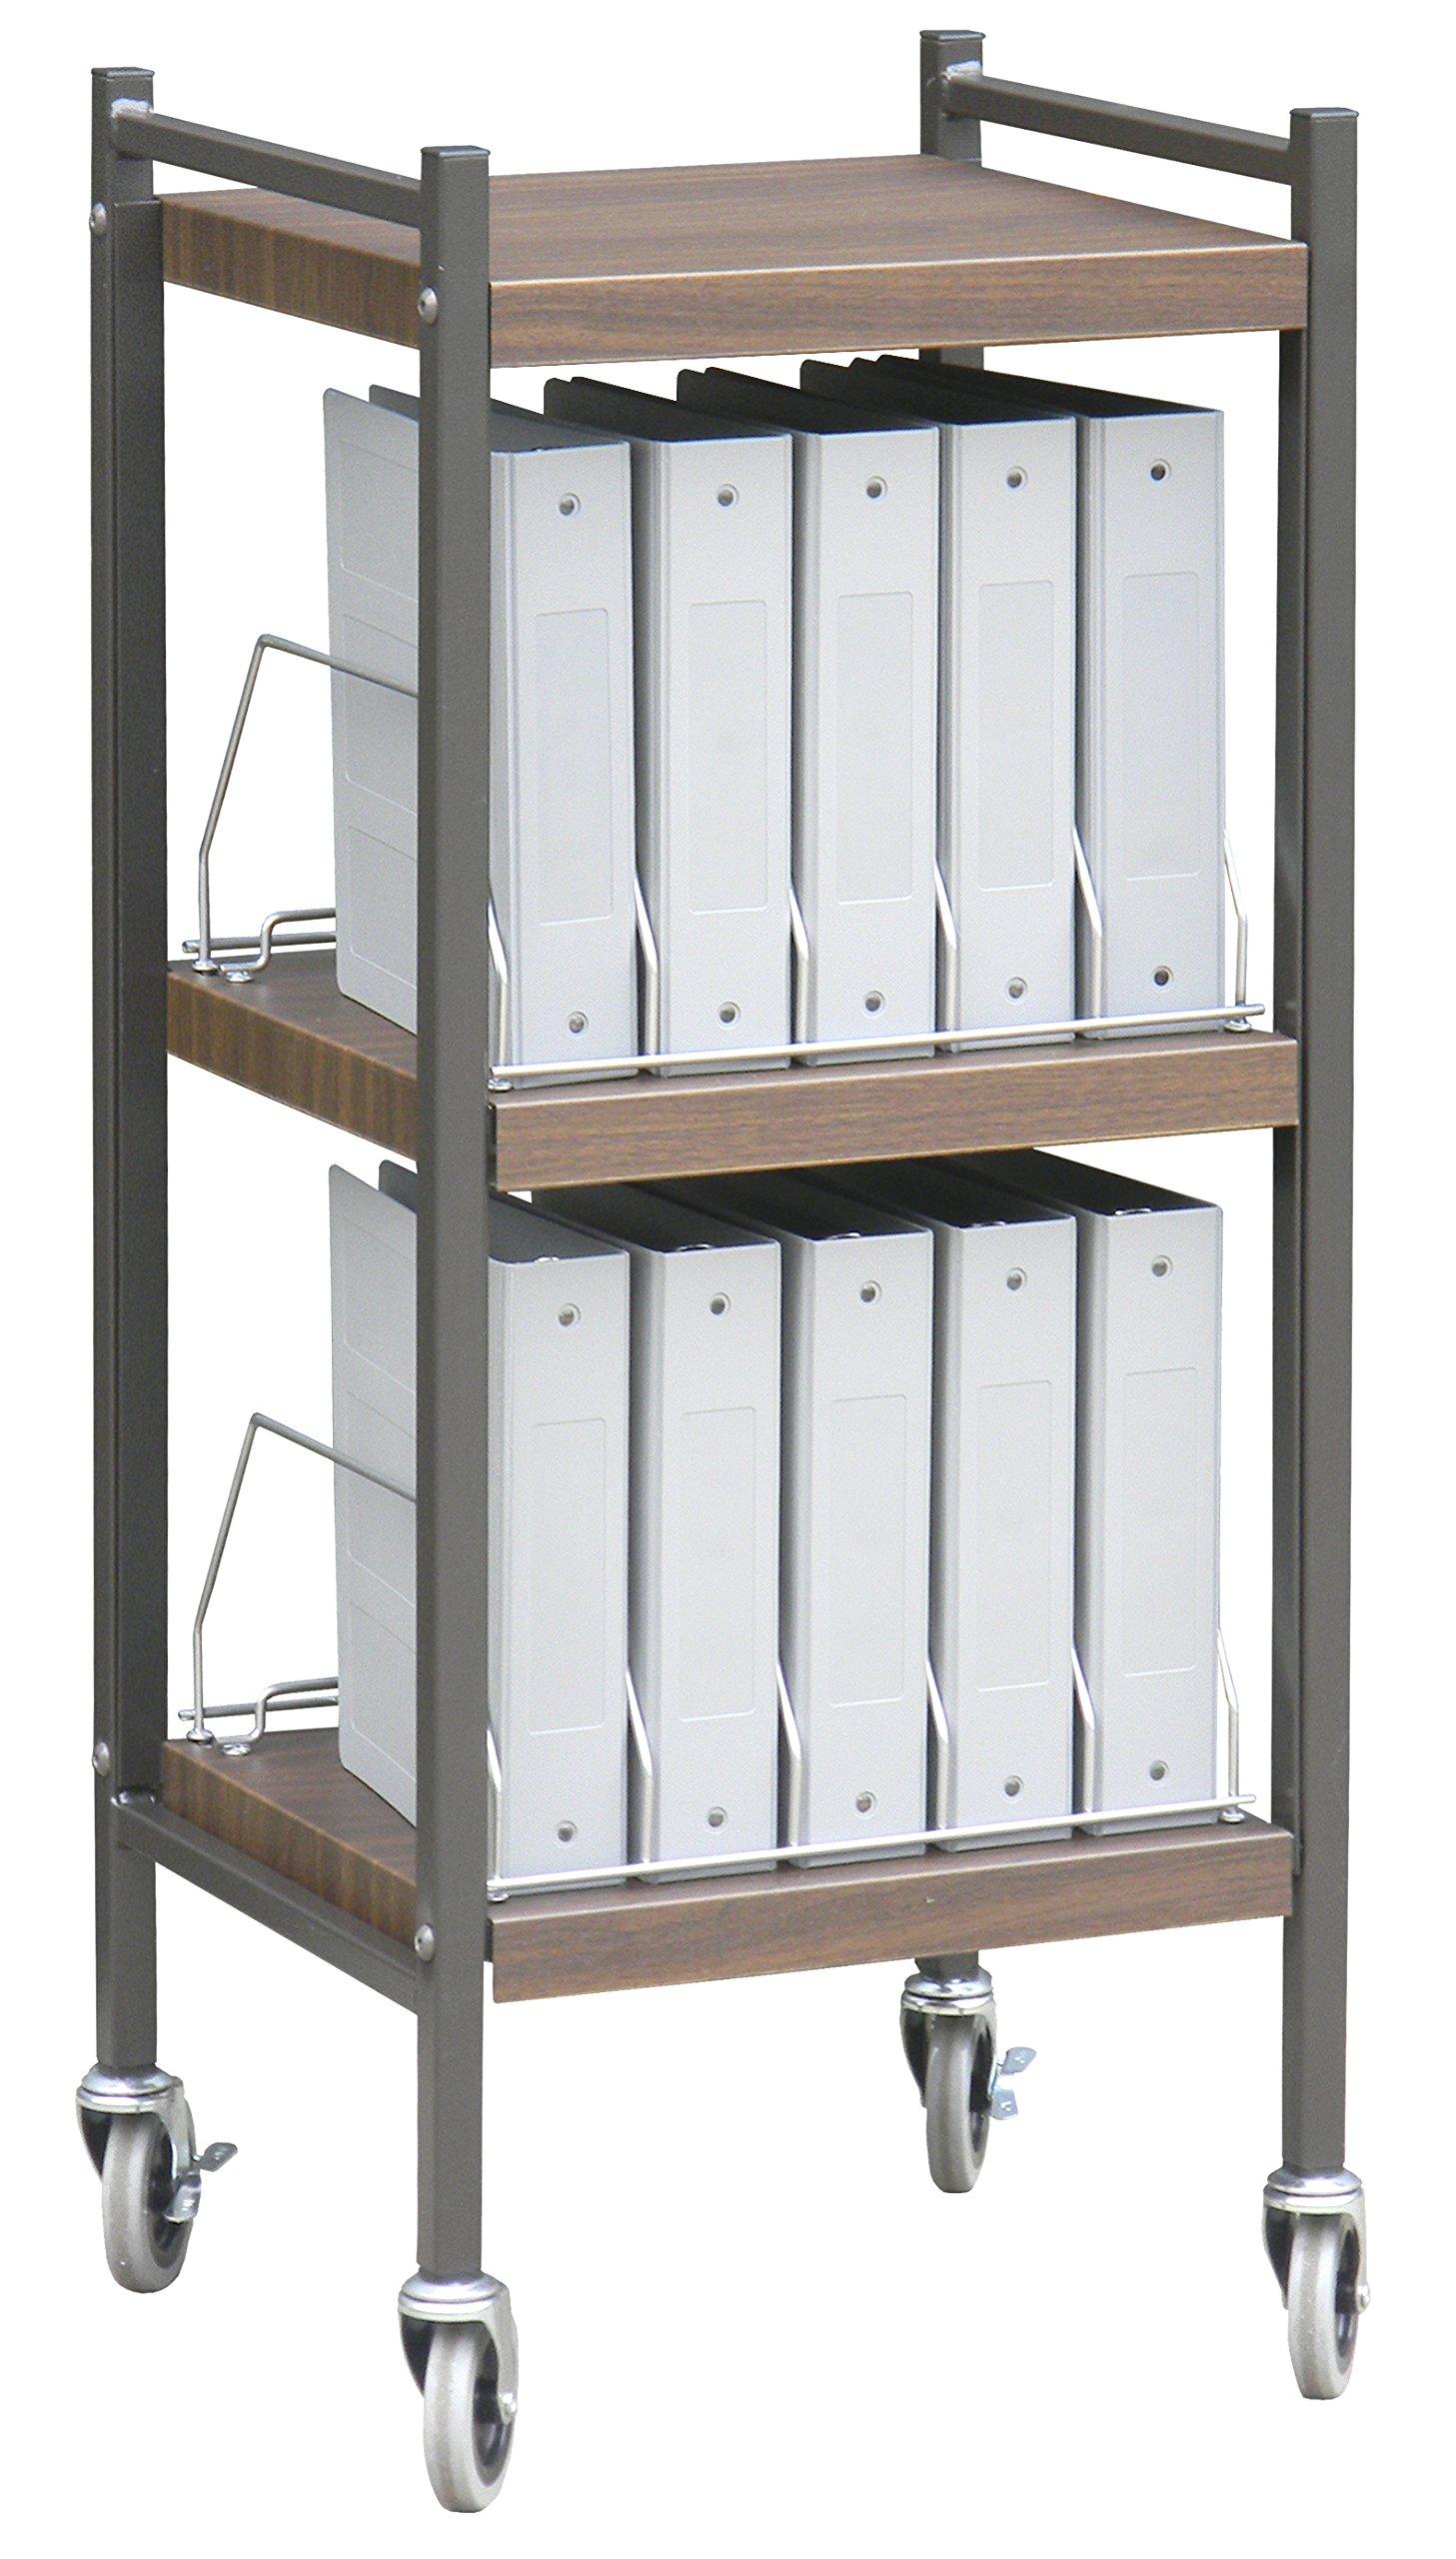 Mini Open Chart Rack 3 Shelves 10 Binder Capacity (Woodgrain)